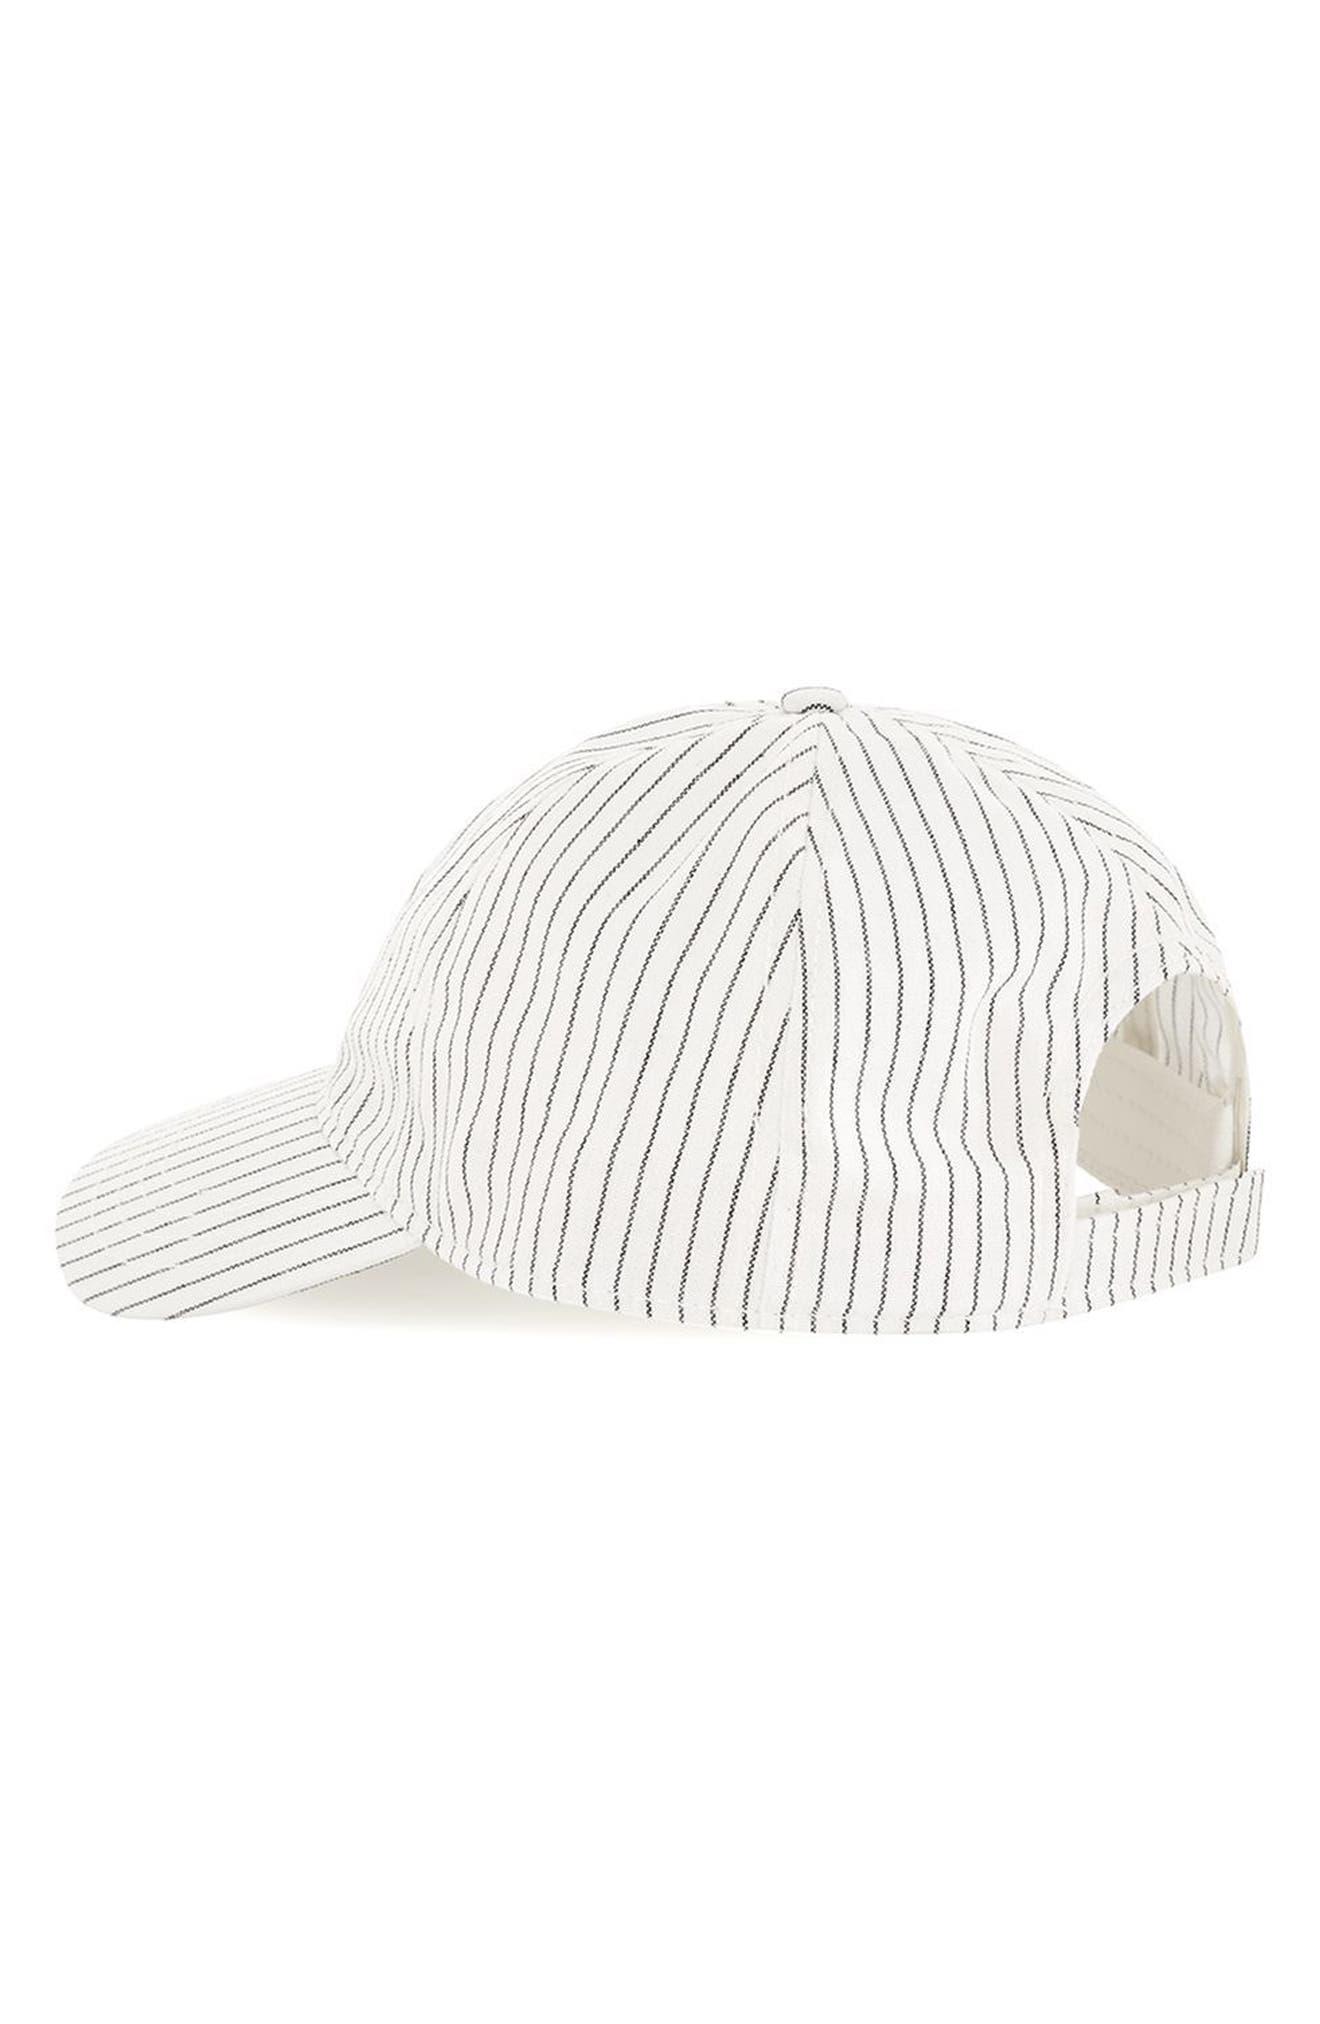 Stripe Boys Curved Peak Cap,                             Alternate thumbnail 2, color,                             White Multi